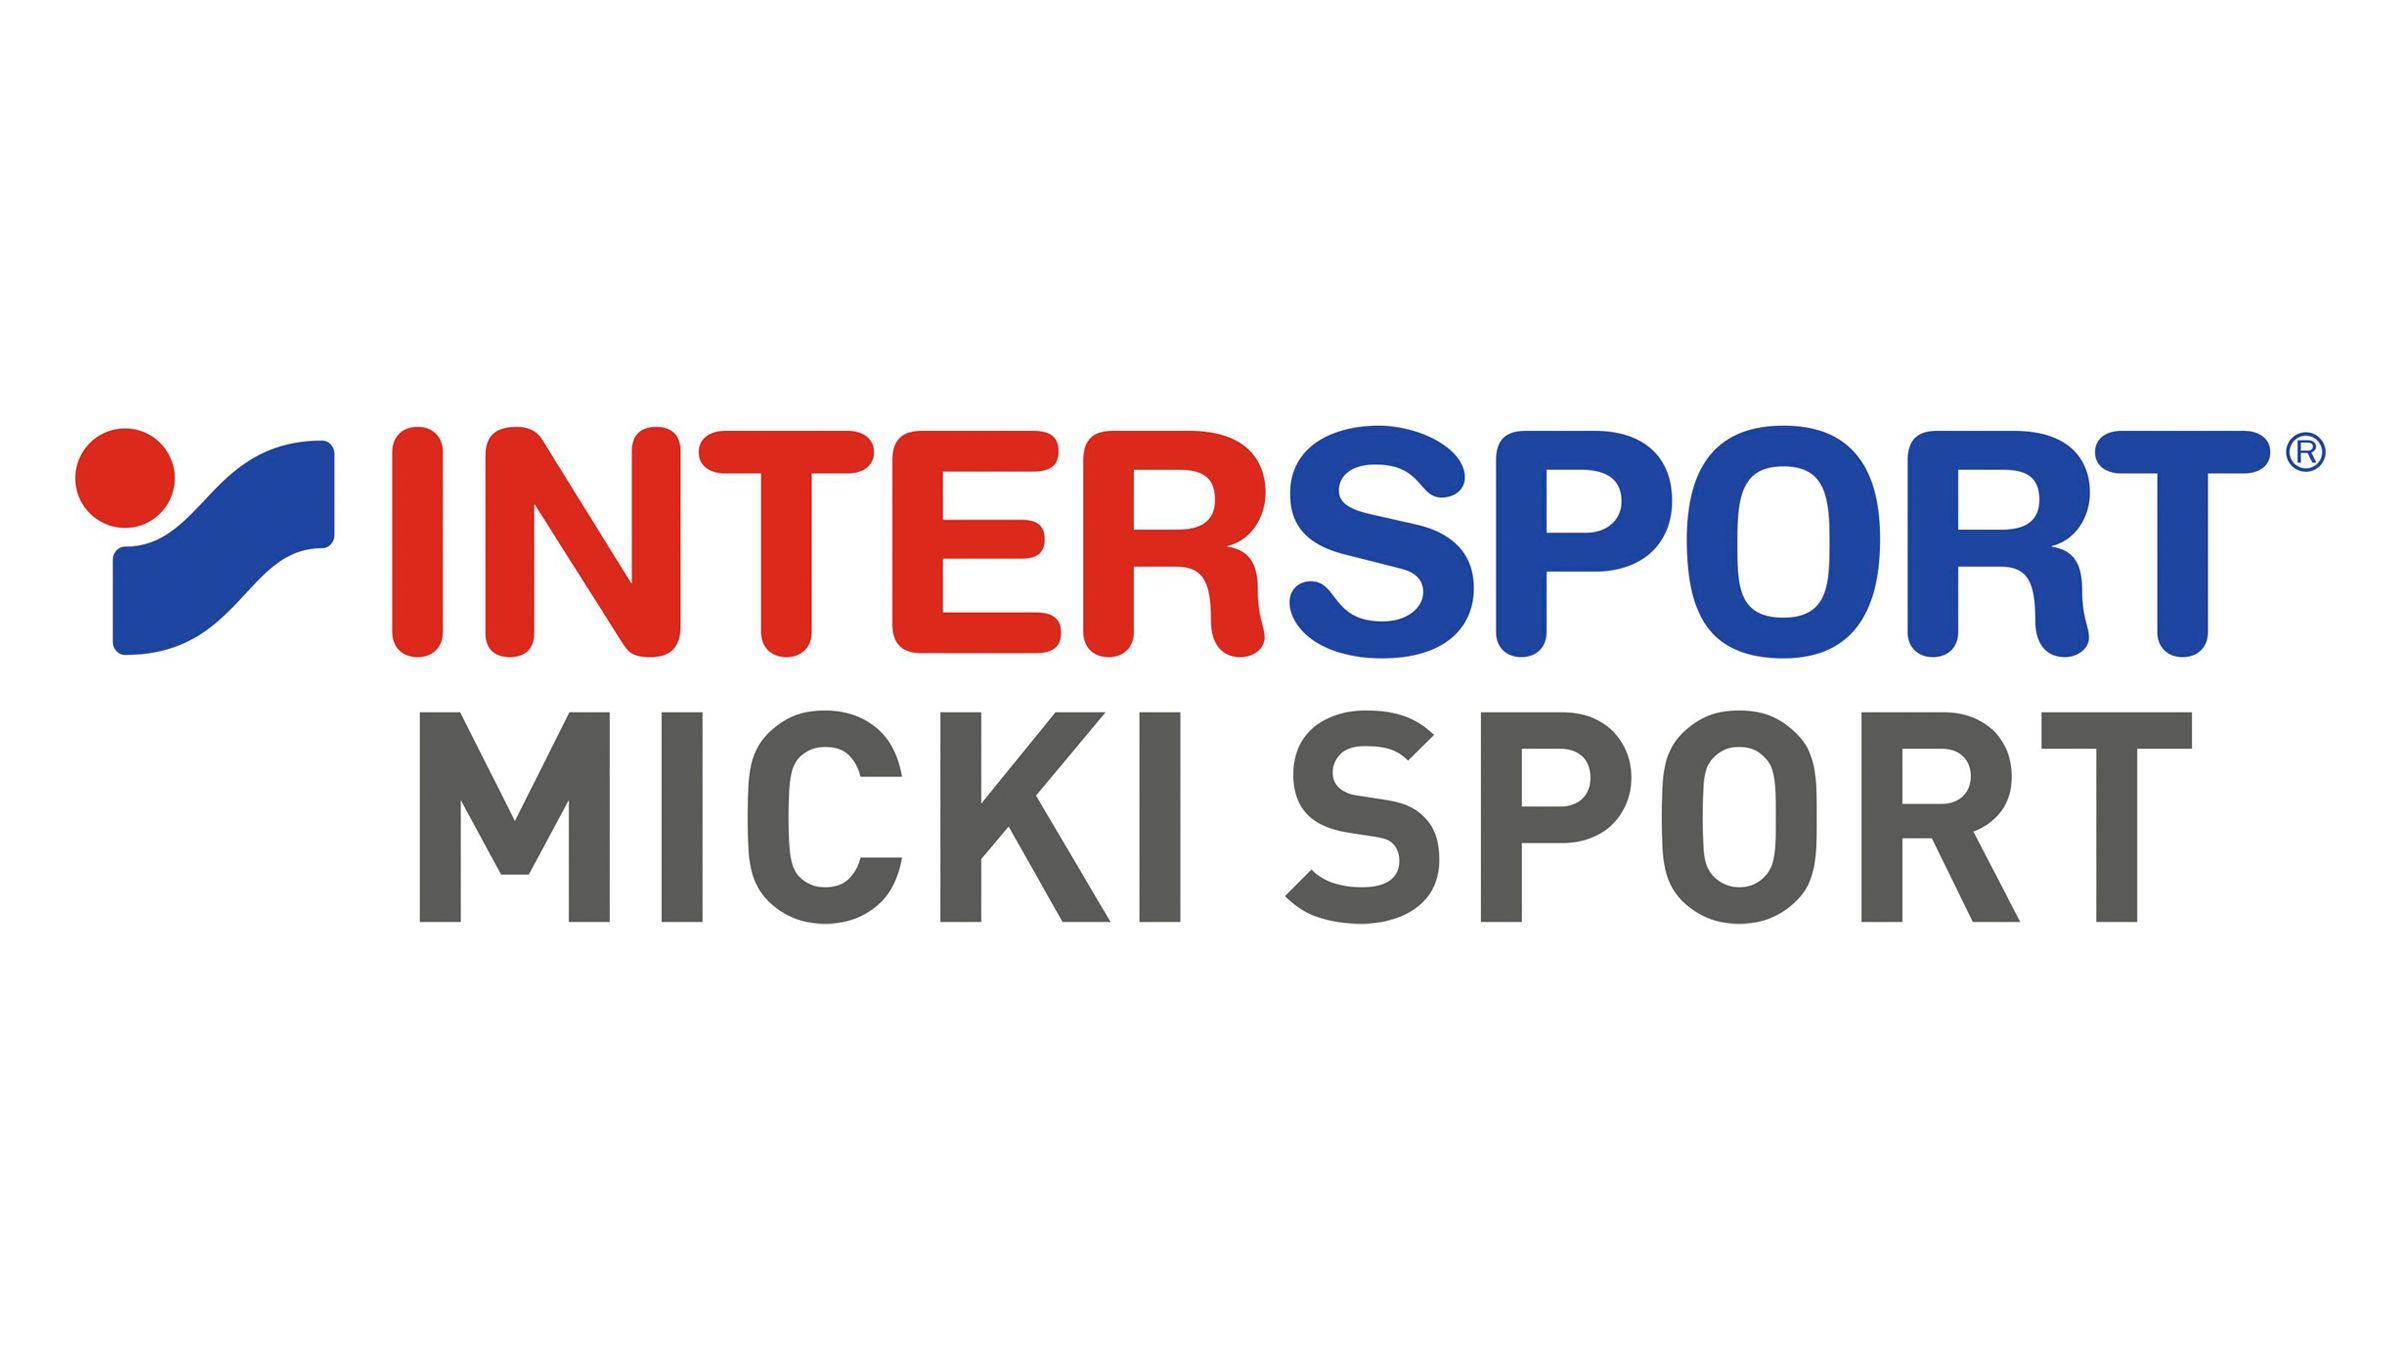 Intersport Mickisport